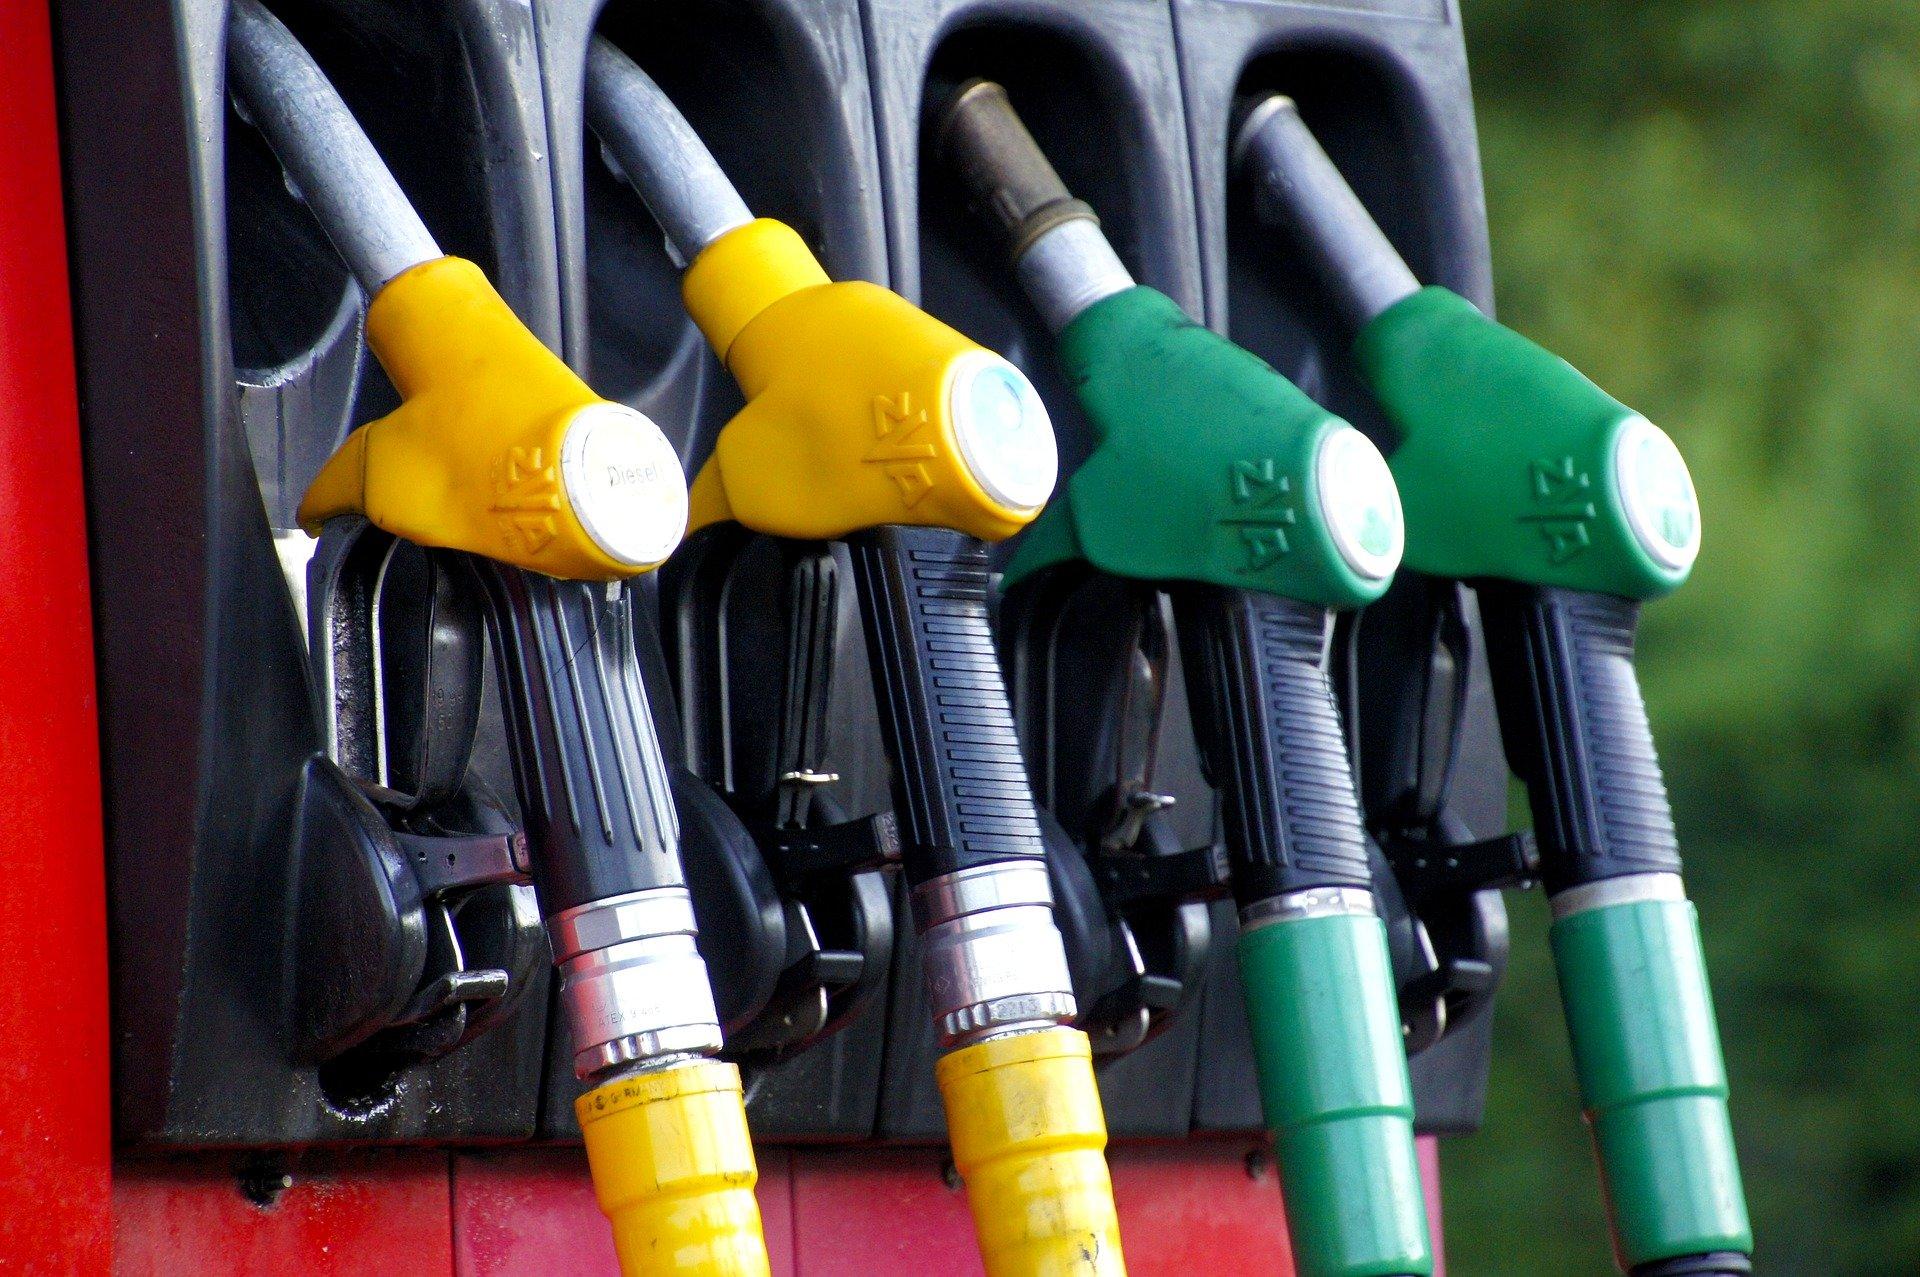 Pixabay – Fuel Station II